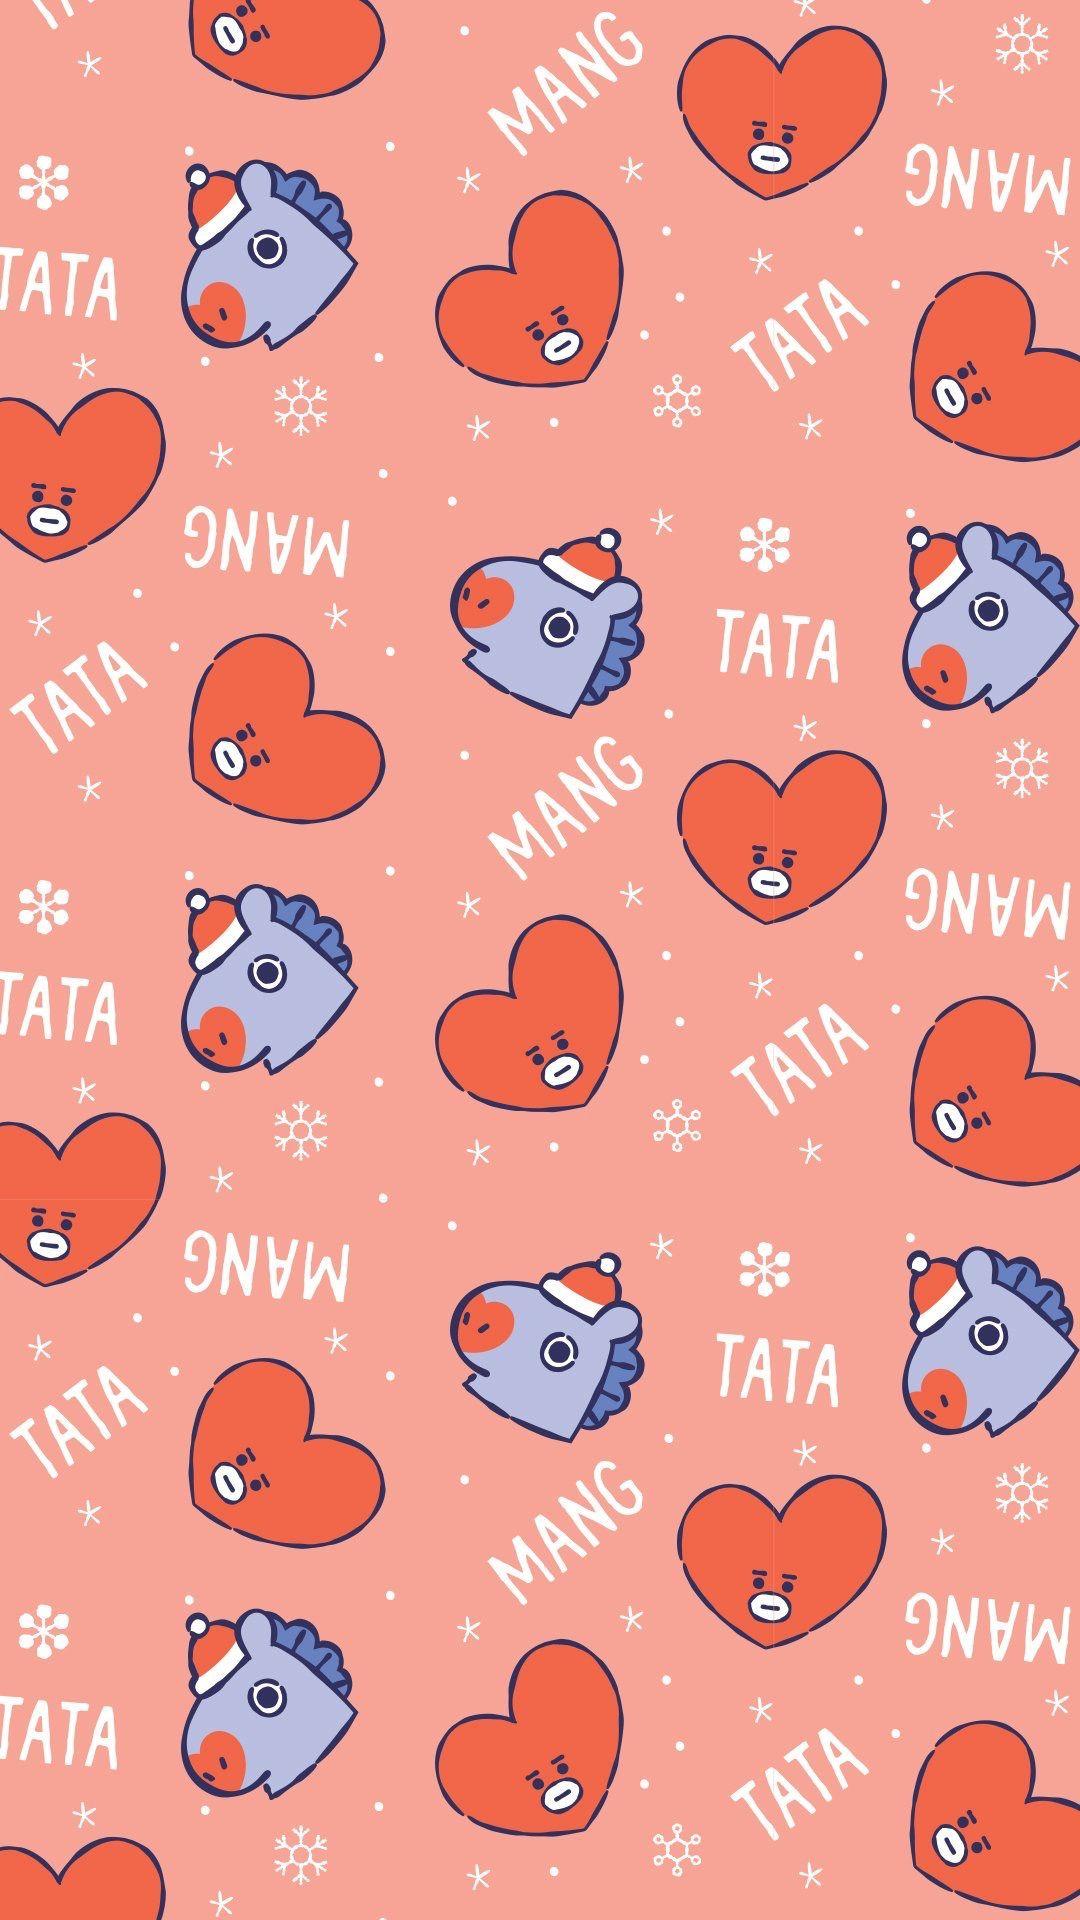 Bt21 Christmas Wallpaper Bt21 Mang Tata Wallpaper Bts Christmas Bts Wallpaper Bts